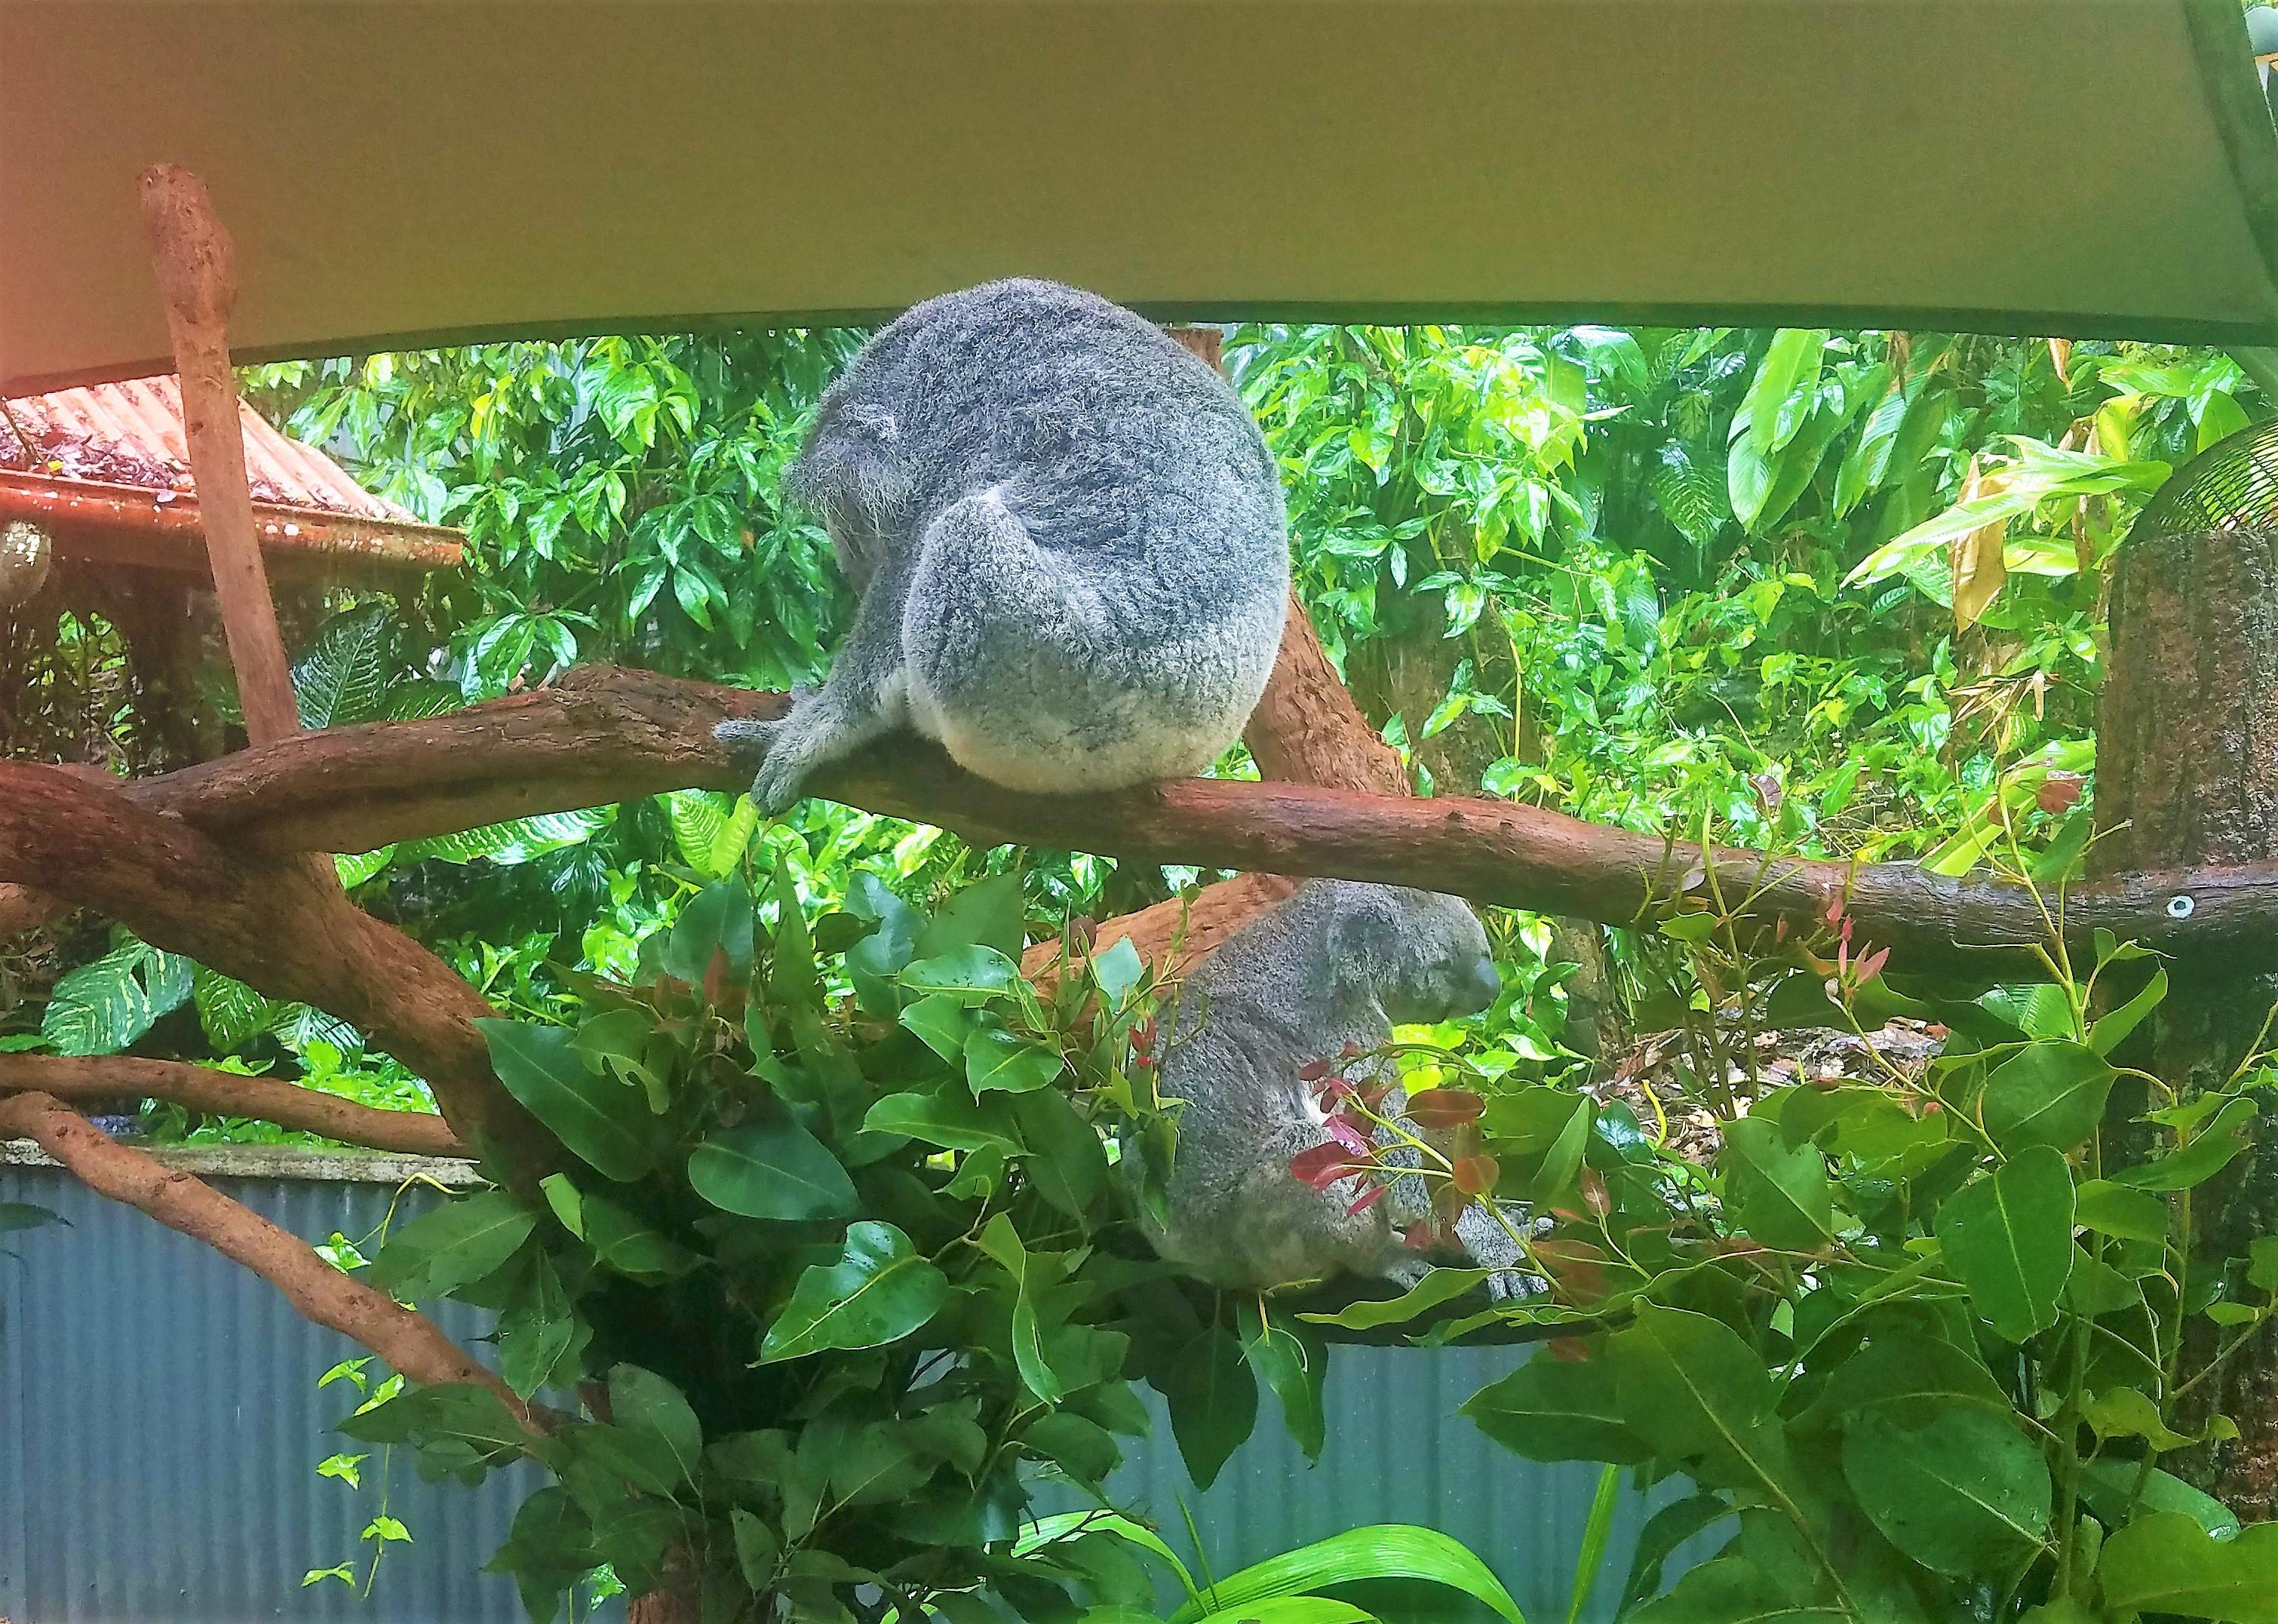 Australia Travel Guide | Kuranda Railway and Skyway Excursion from Cairns, Queensland | Cuddle a Koala at Kuranda Koala Gardens